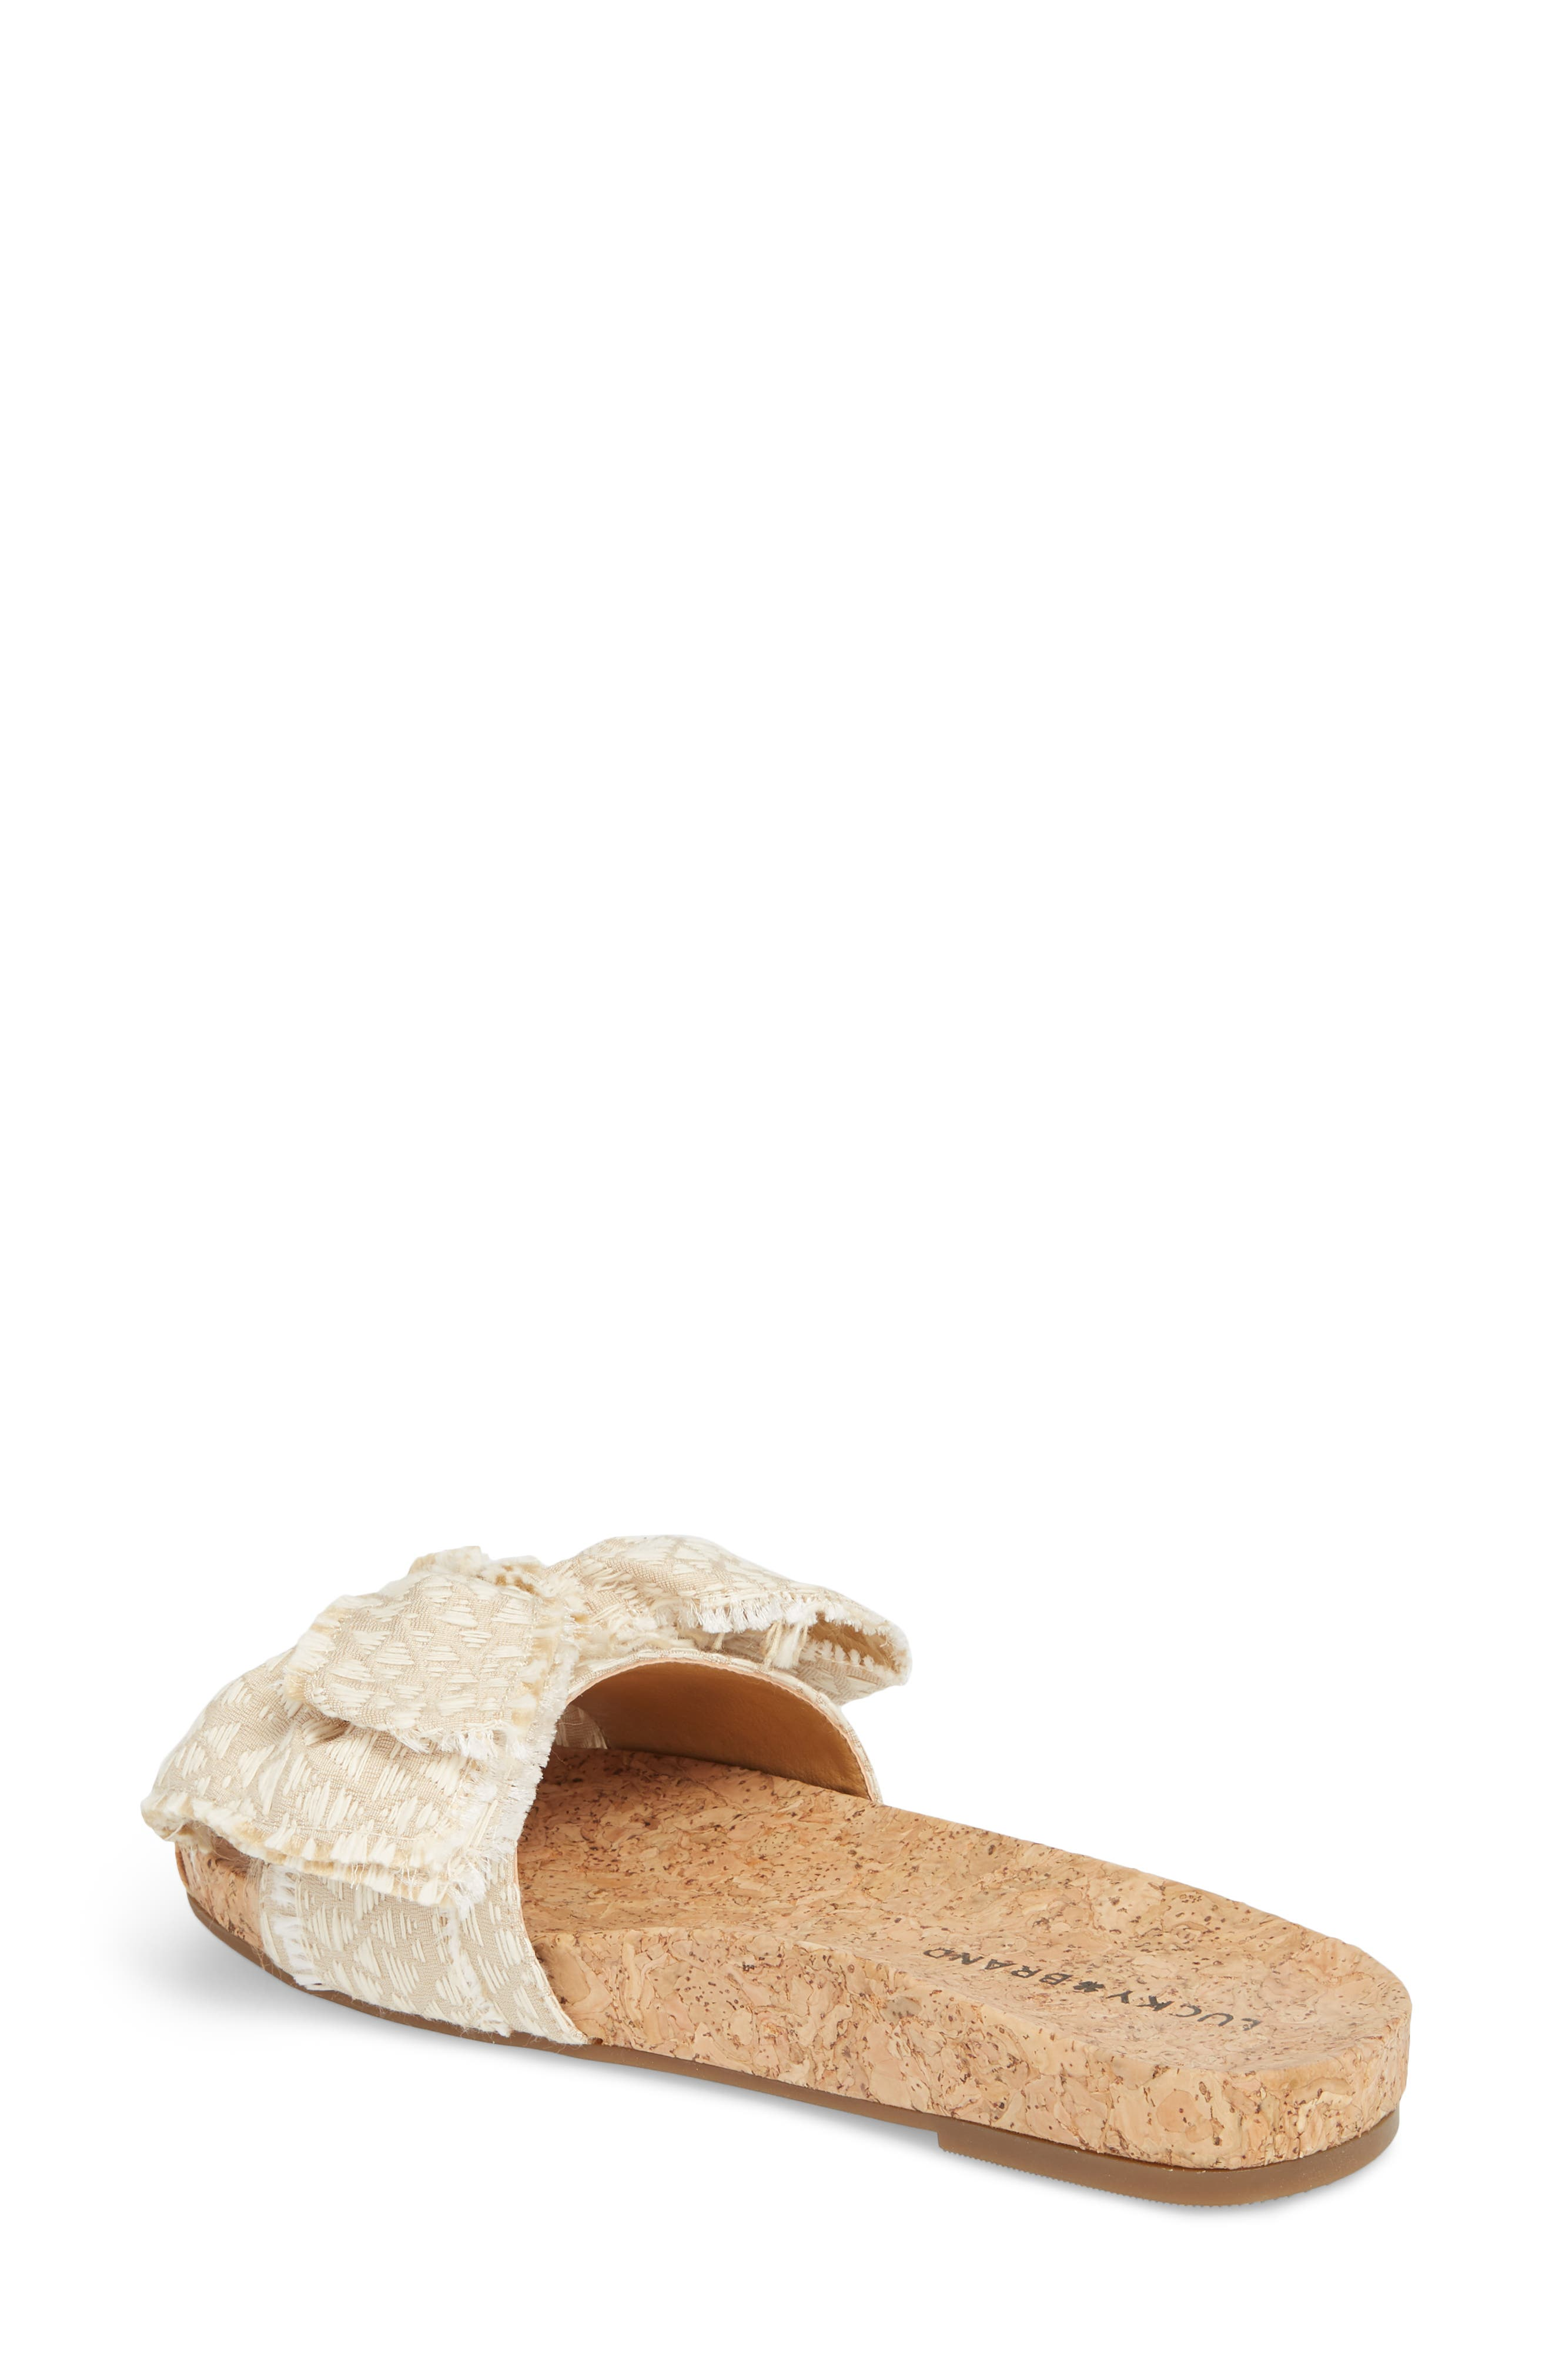 Floella Bow Slide Sandal,                             Alternate thumbnail 2, color,                             270